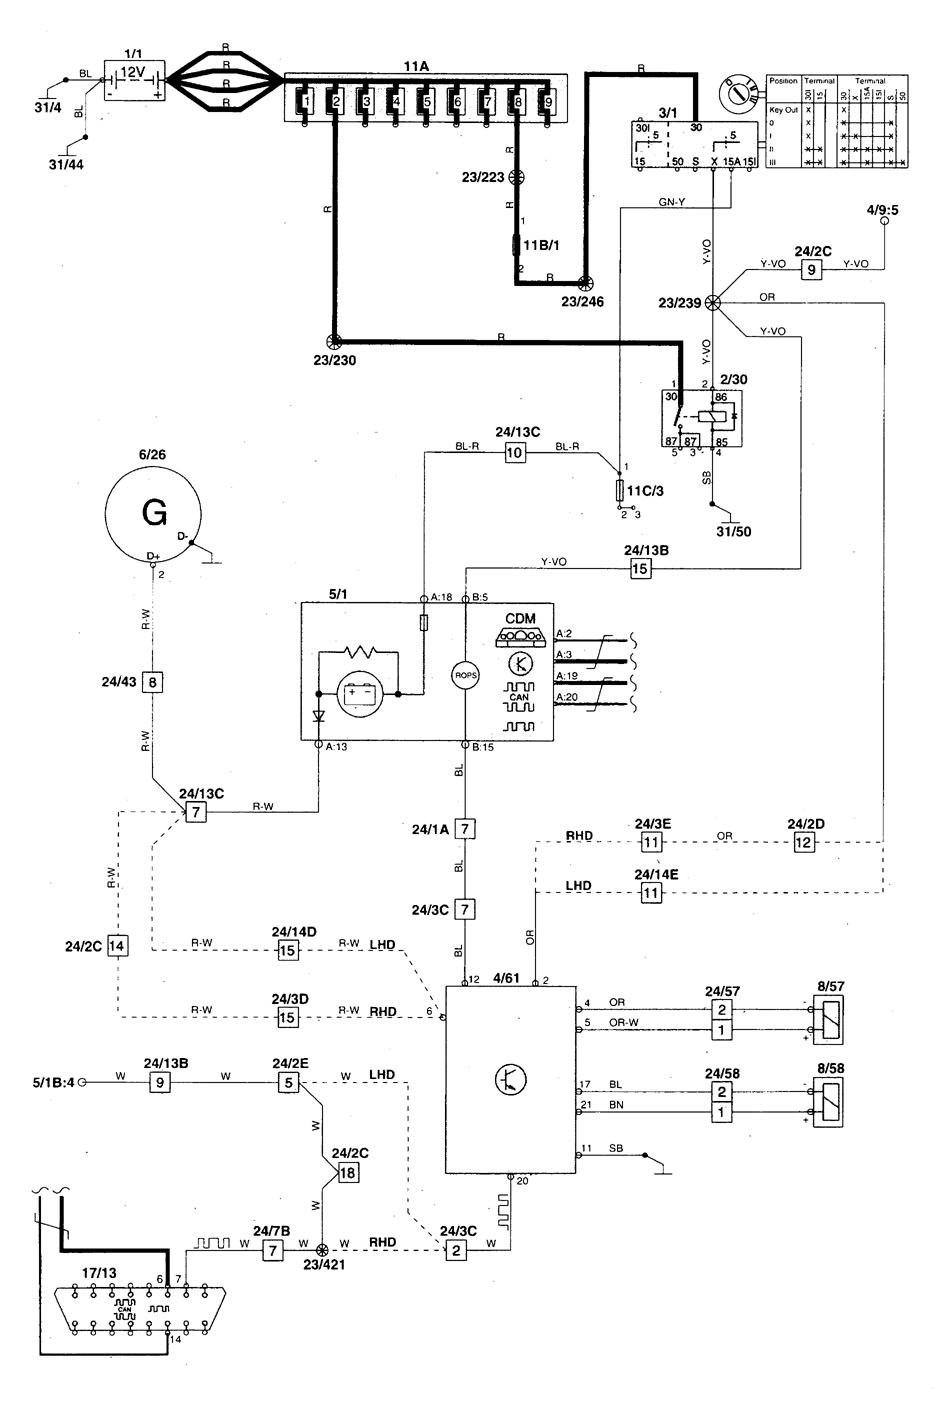 Stunning c70 wiring diagram ideas wiring diagram ideas blogitia